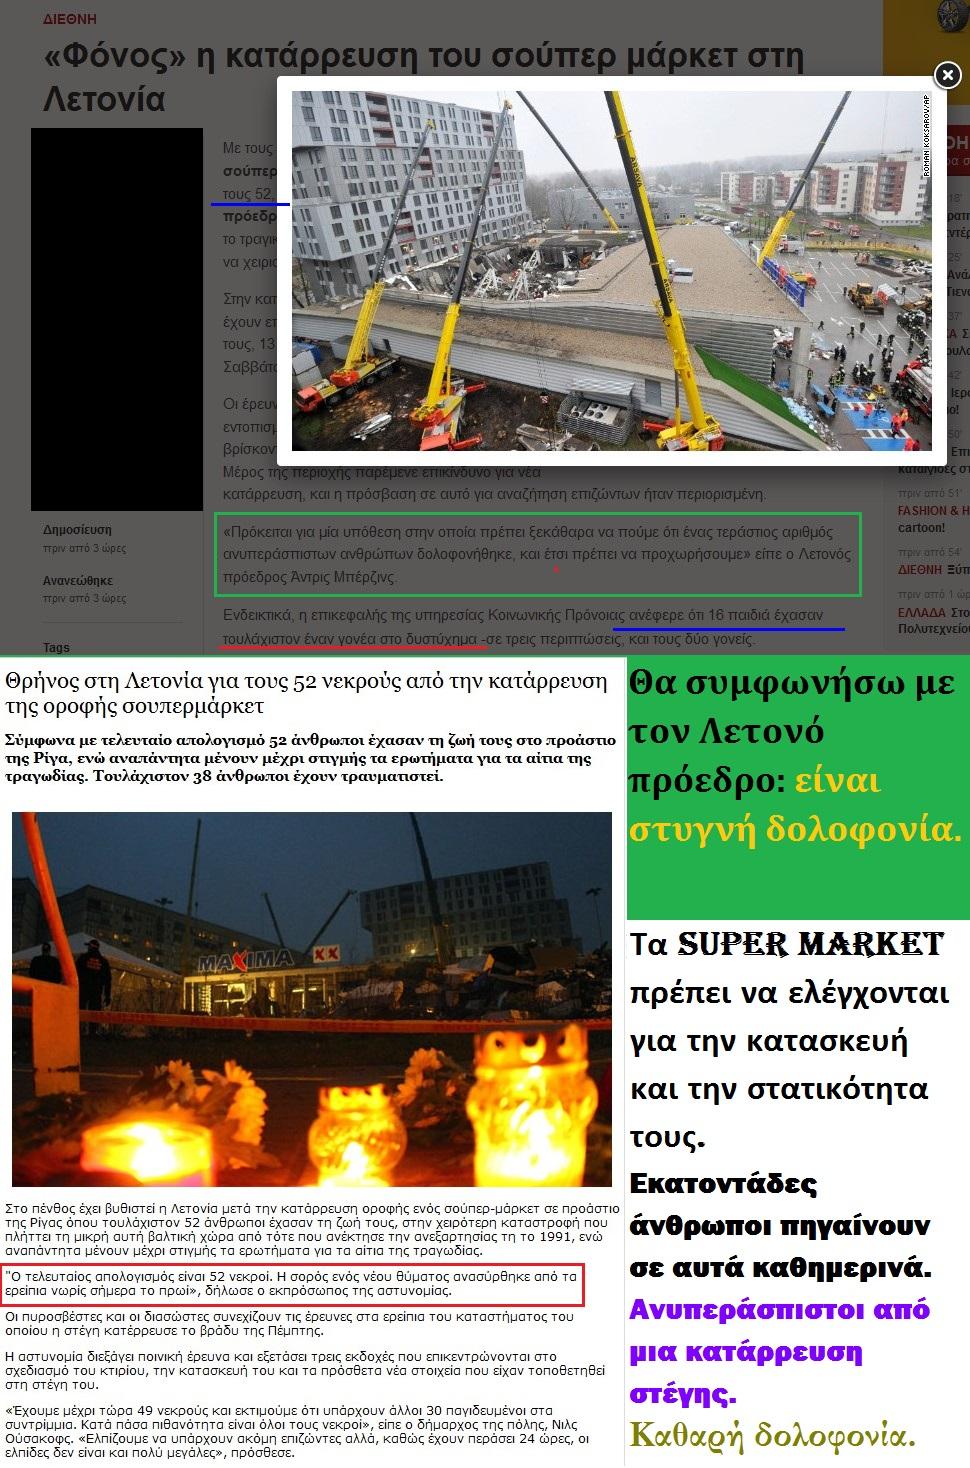 LETONIA SUPER MARKET NEKROI 02 231113